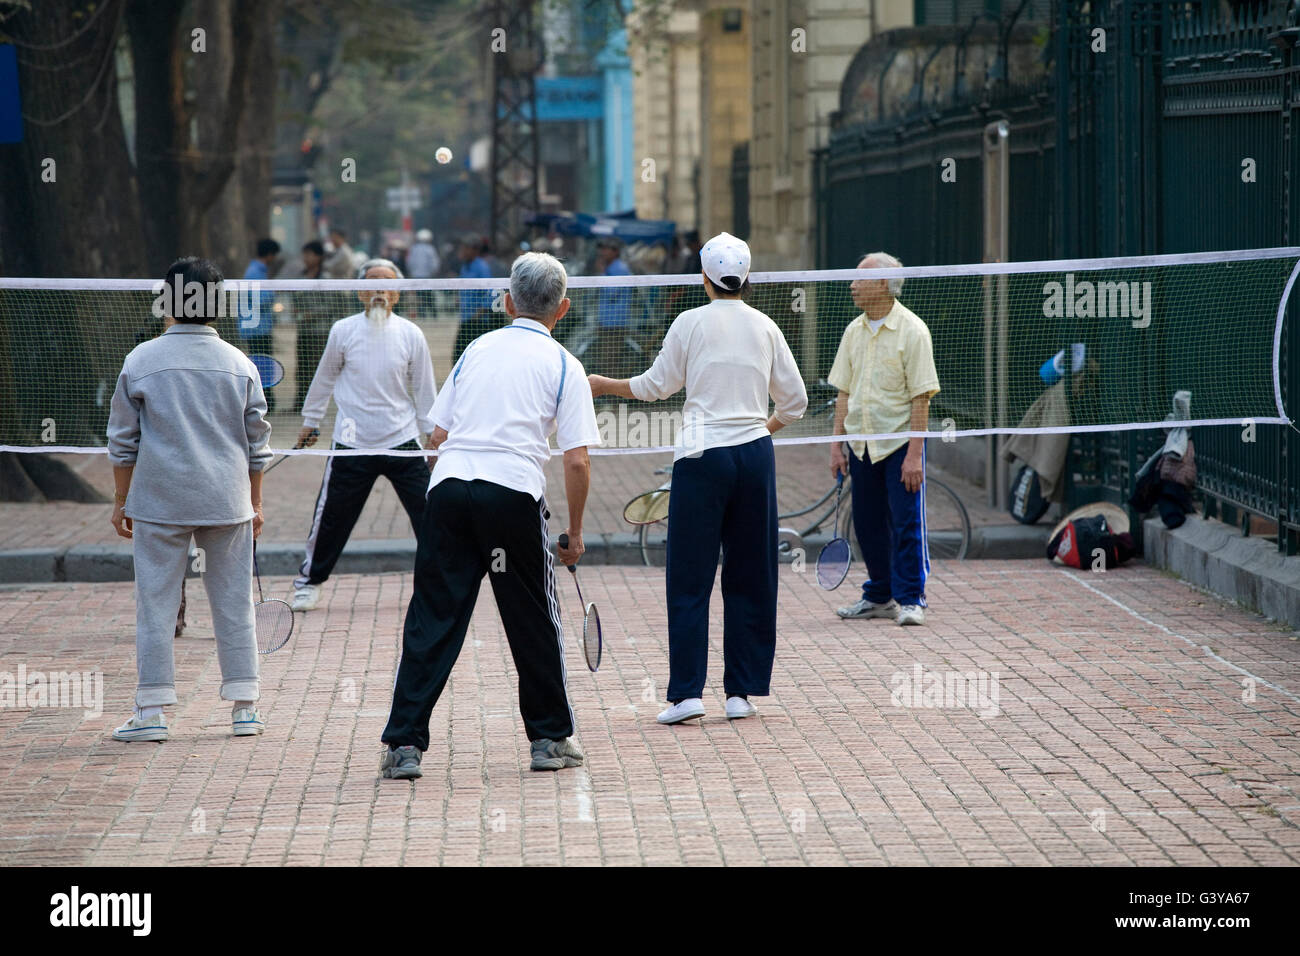 People playing badminton on the street, Hanoi, Vietnam, Southeast Asia, Asia - Stock Image